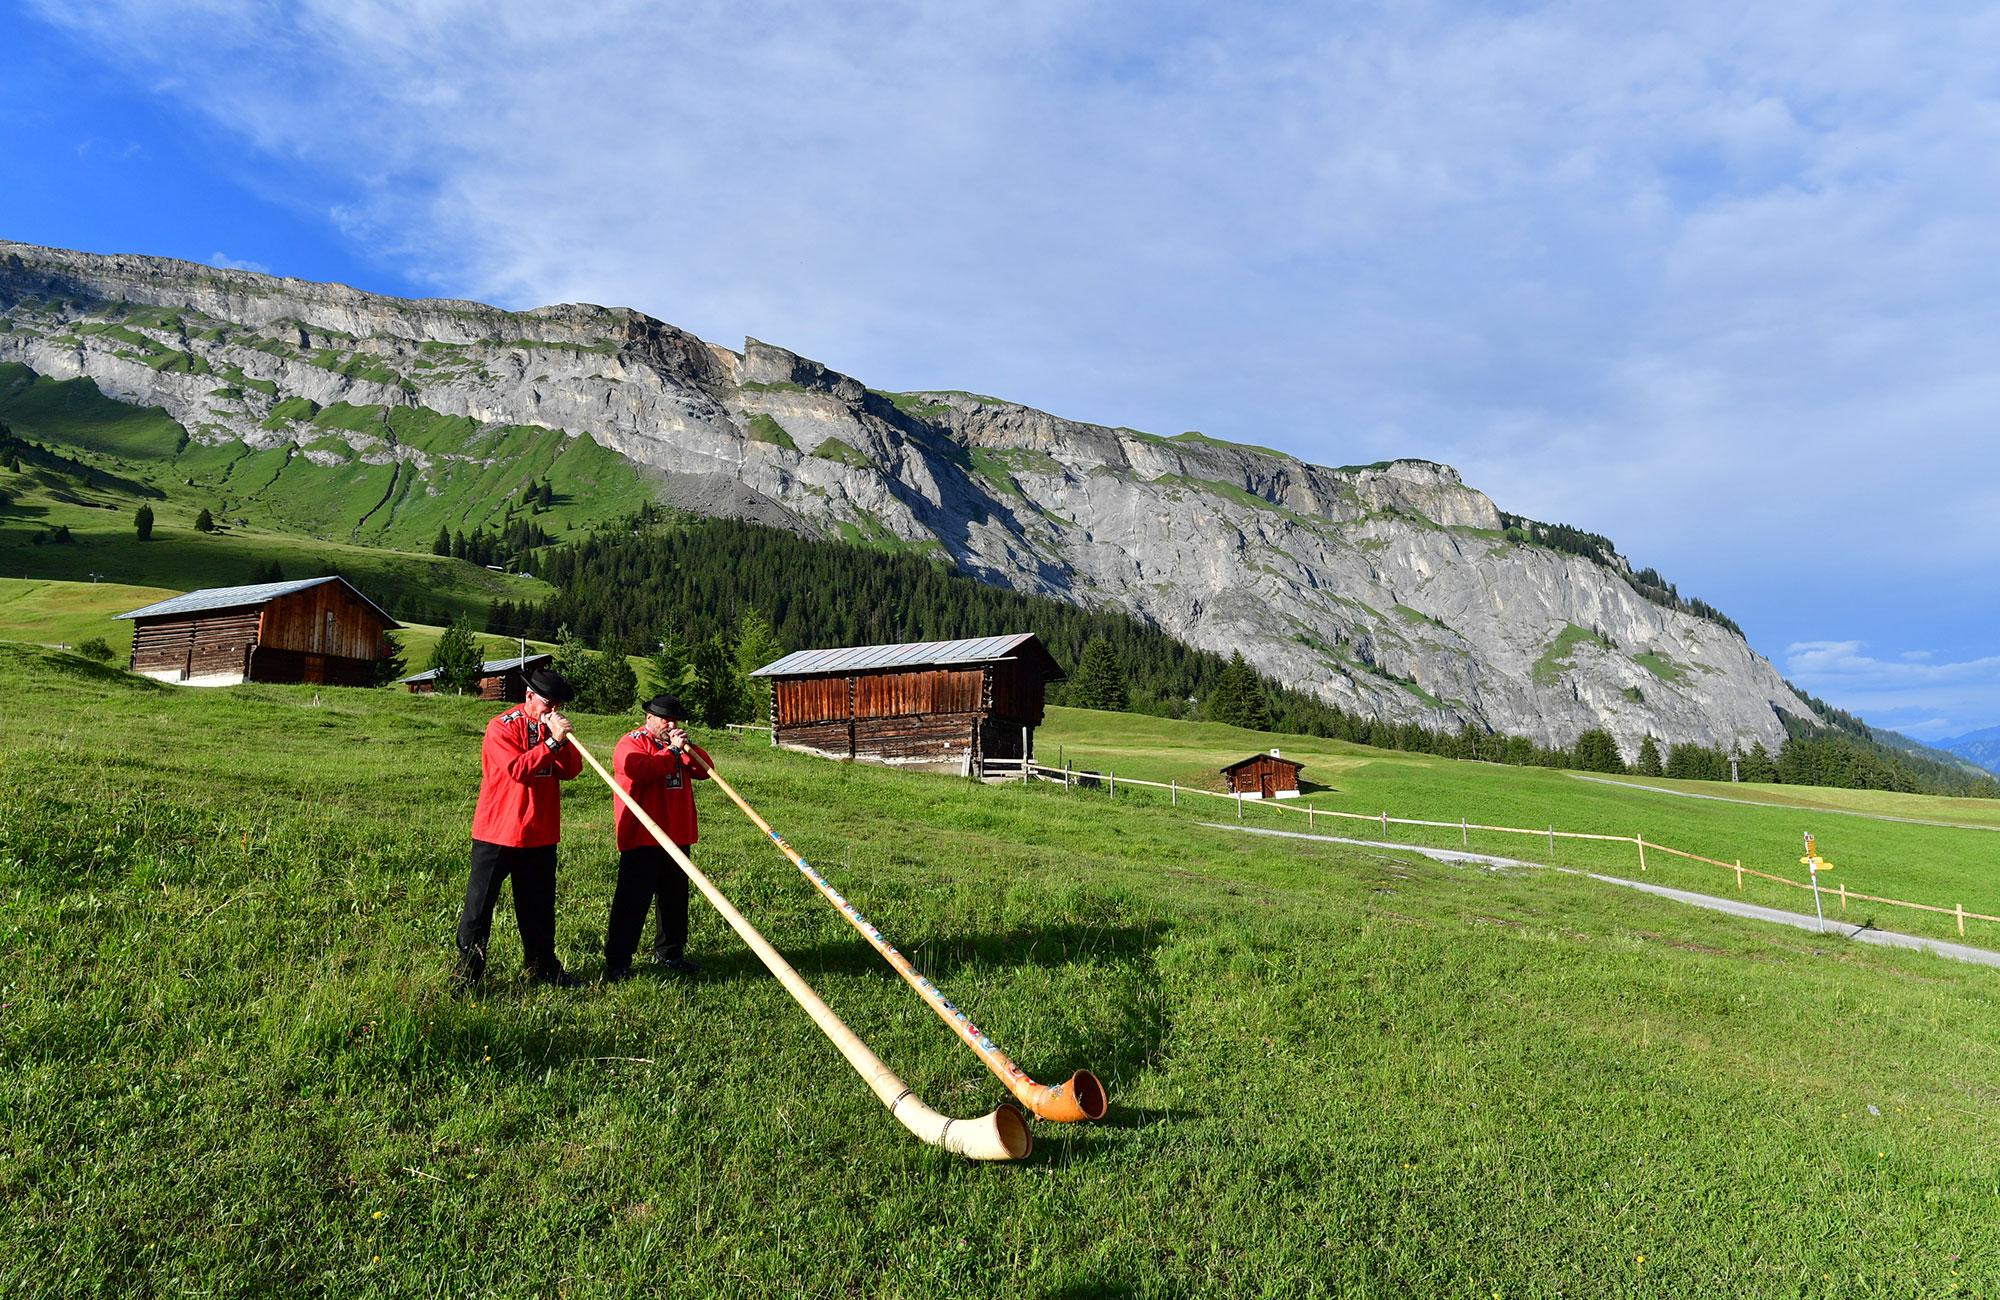 Voyage MICE Suisse - Cor Switzerland Meeting Trophy - Amplitudes